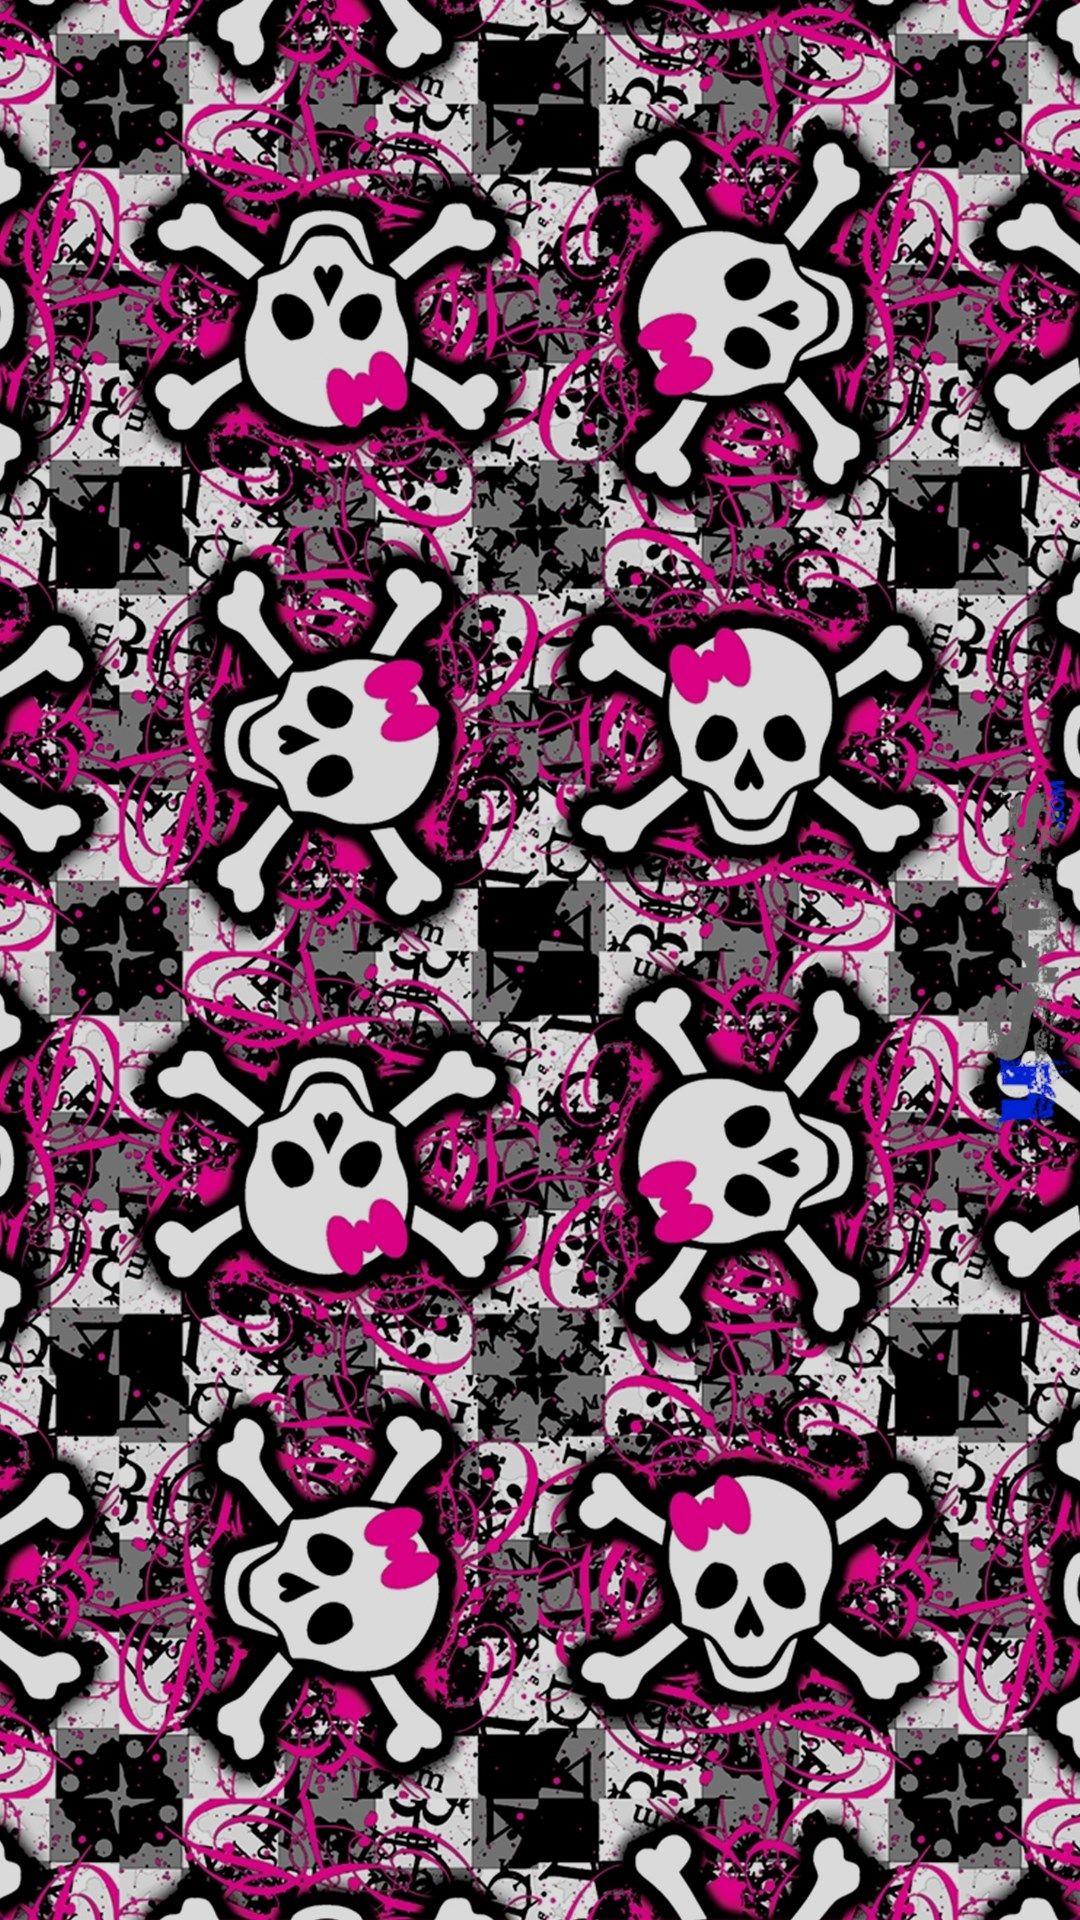 Image results for girly skull girly skulls pinterest girly image results for girly skull voltagebd Choice Image